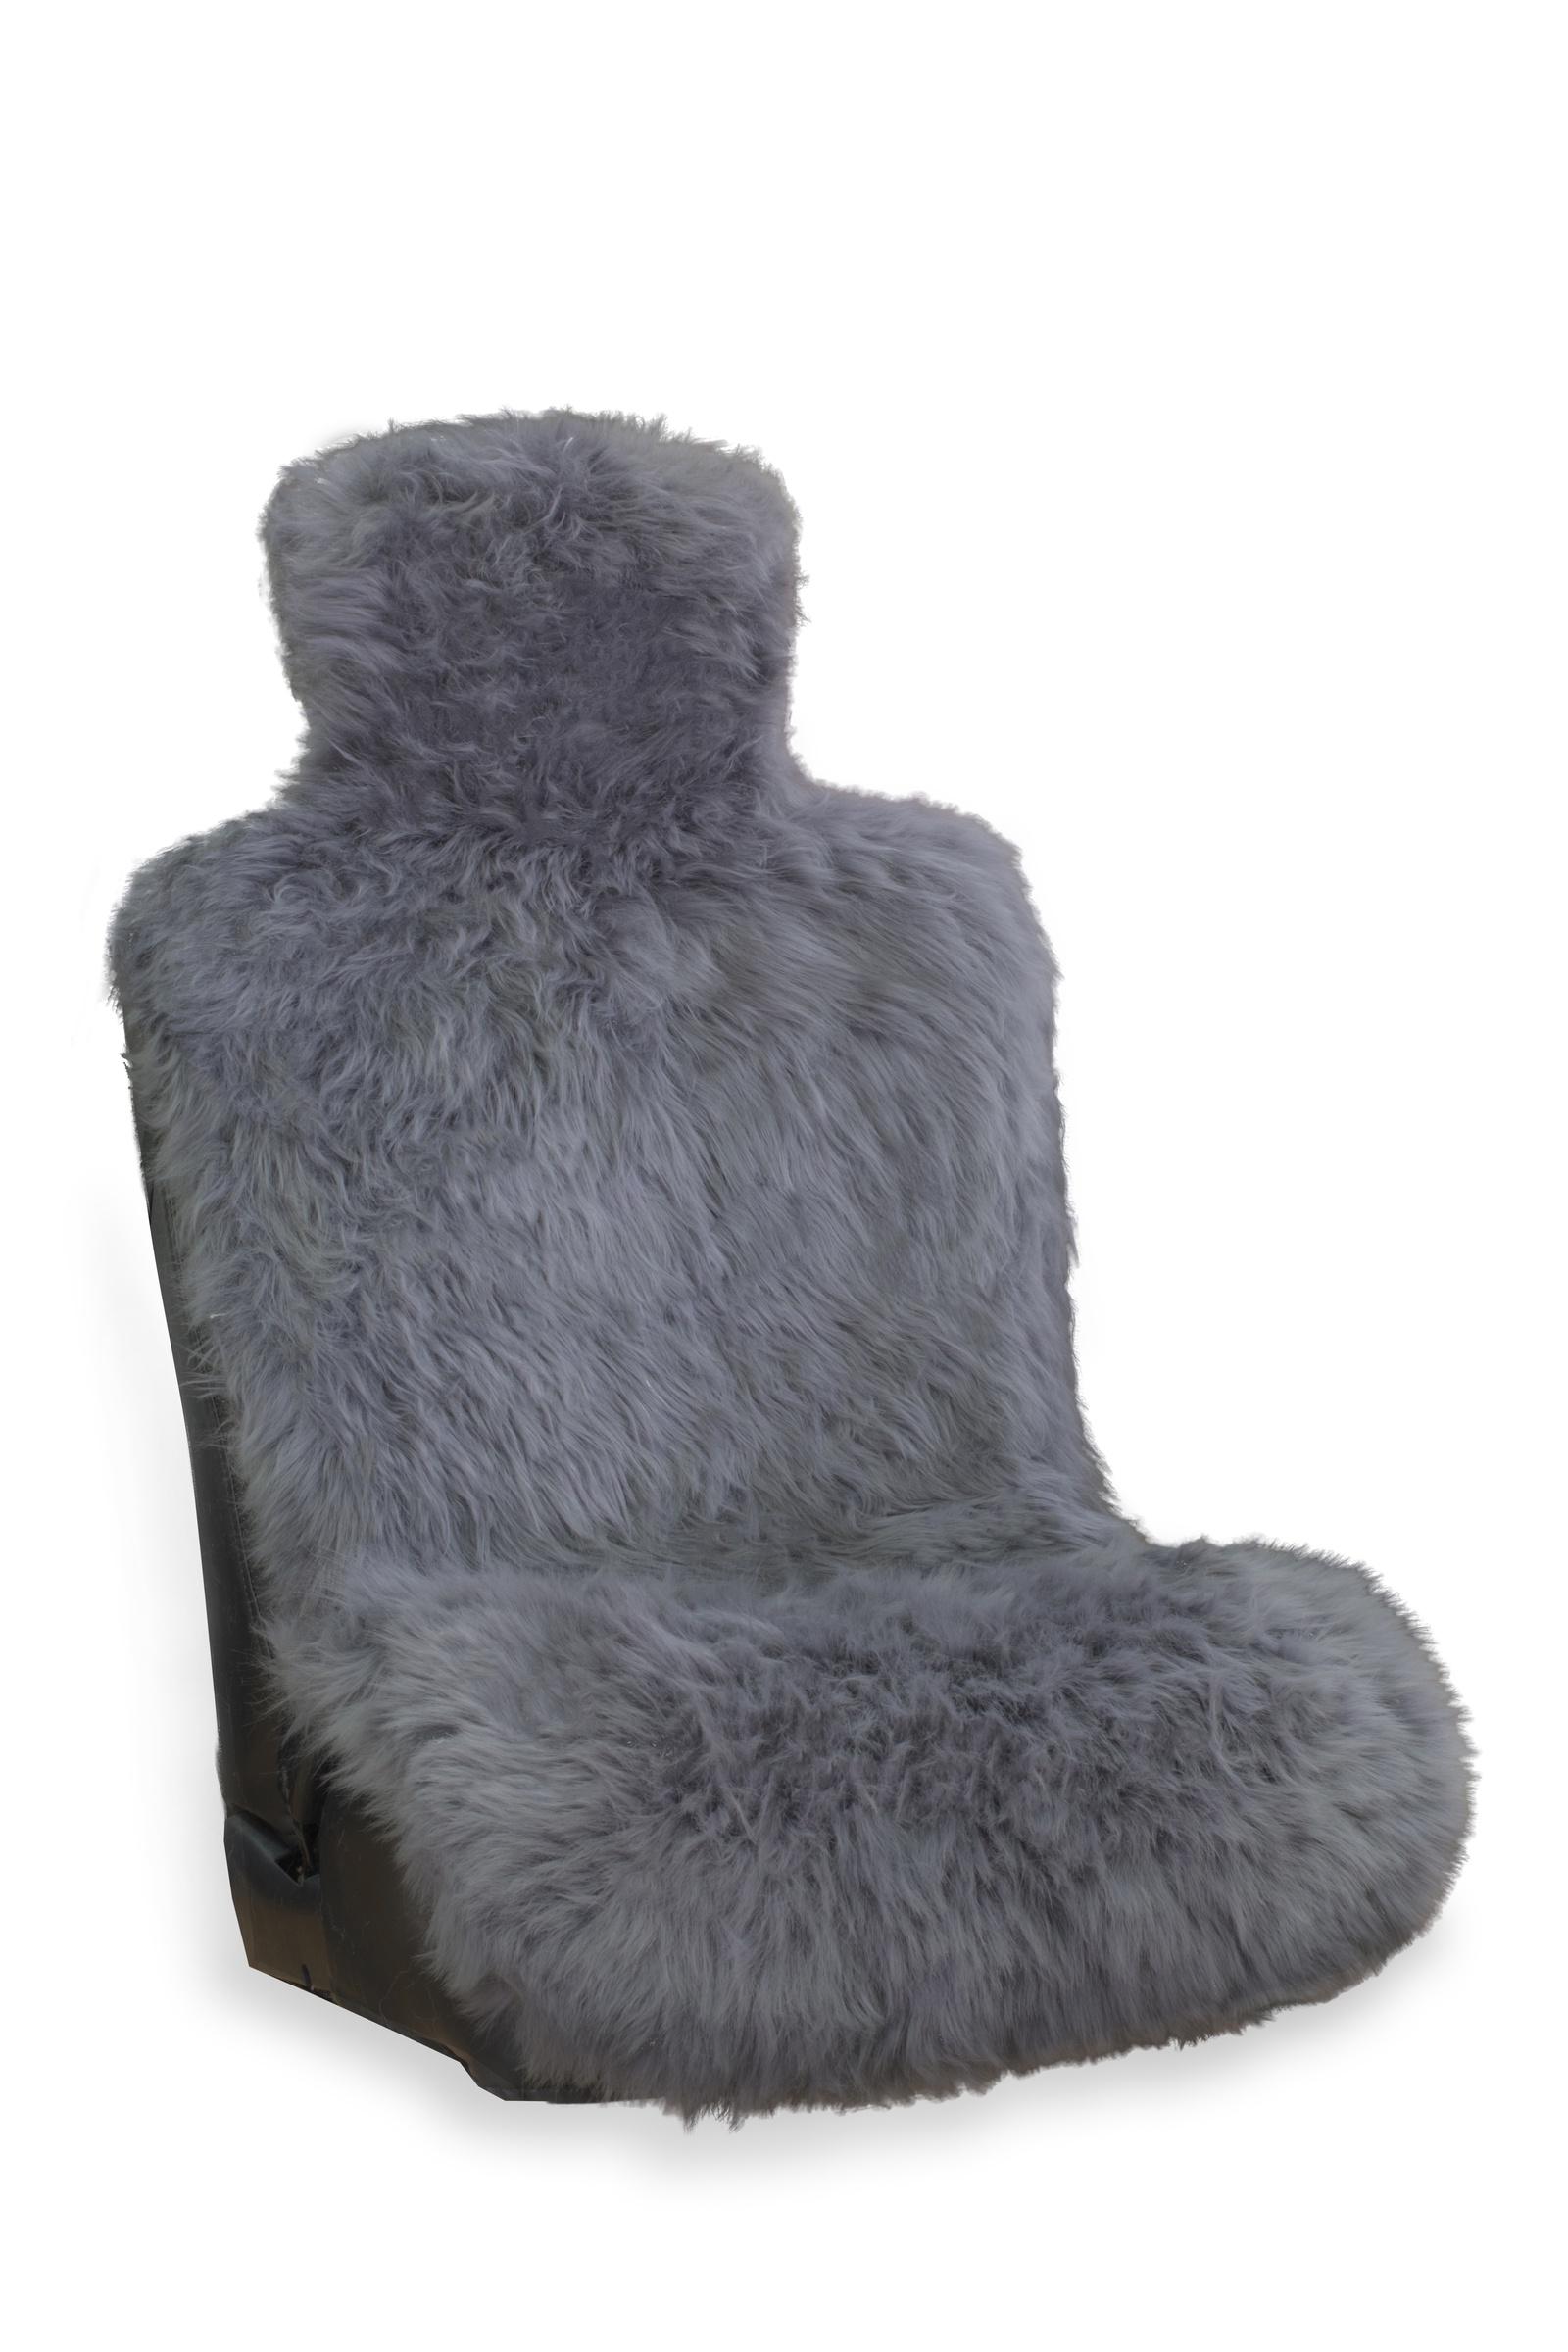 Накидка на сиденье Зигуля Зигуля, 71241Gr, серый